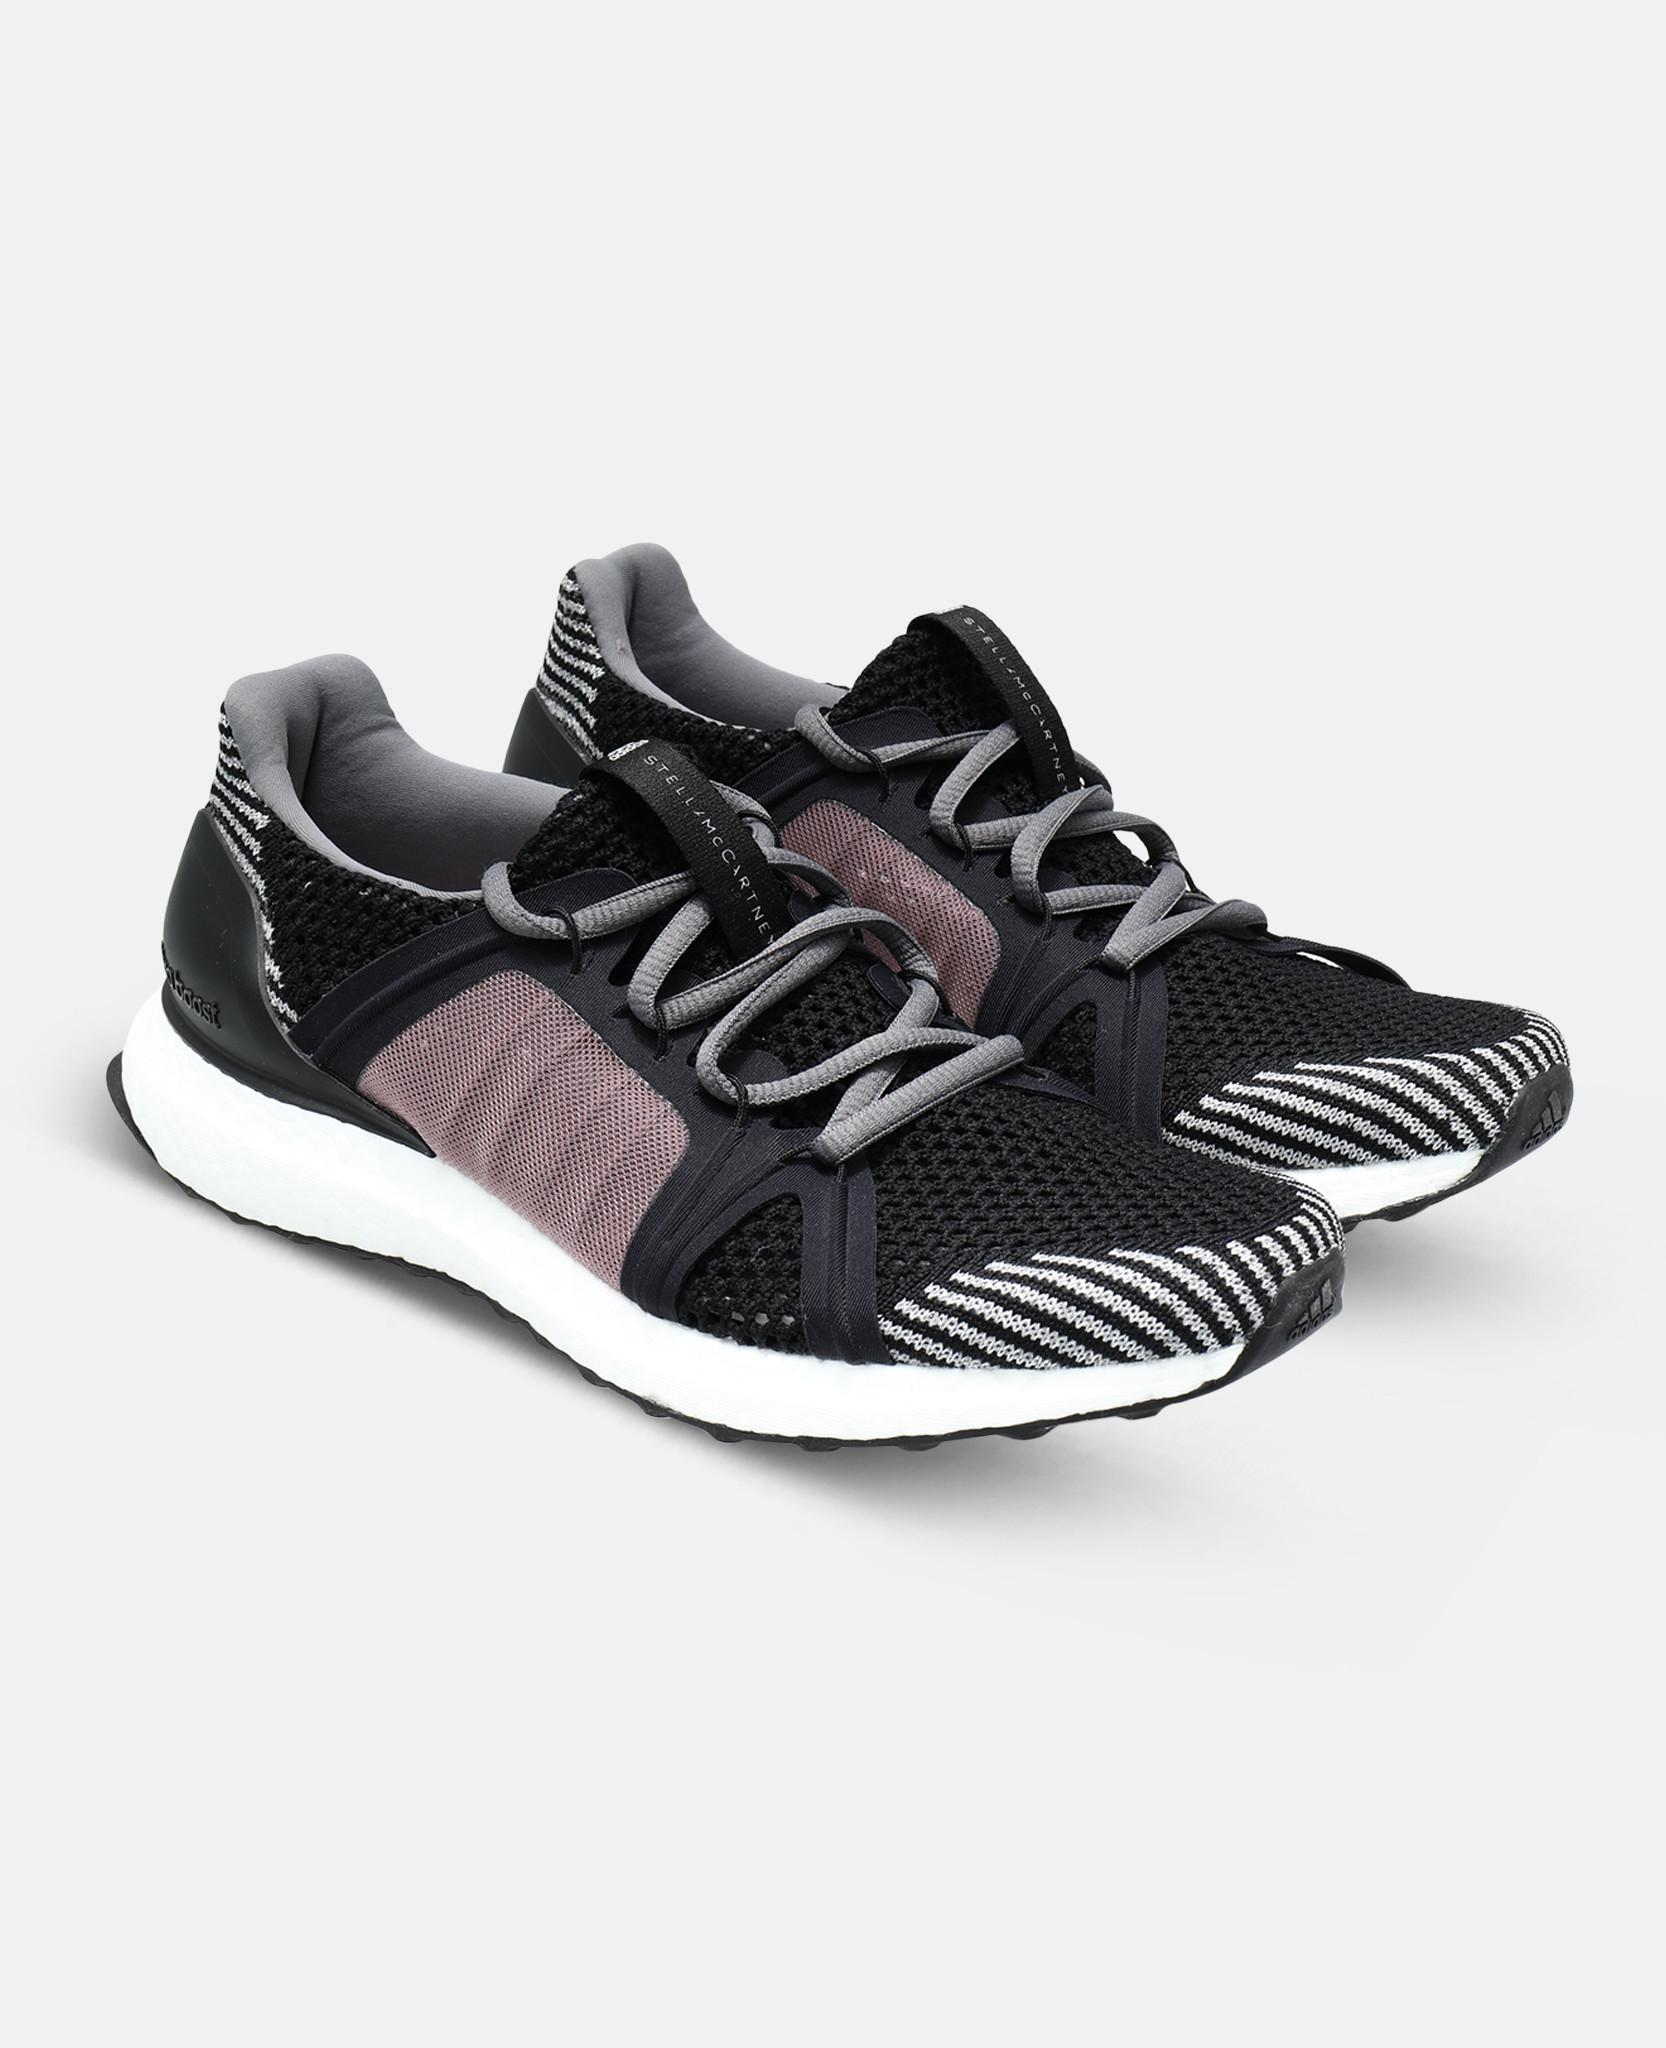 b6b533c1910 Lyst - adidas By Stella McCartney Black Ultraboost Sneakers in Black